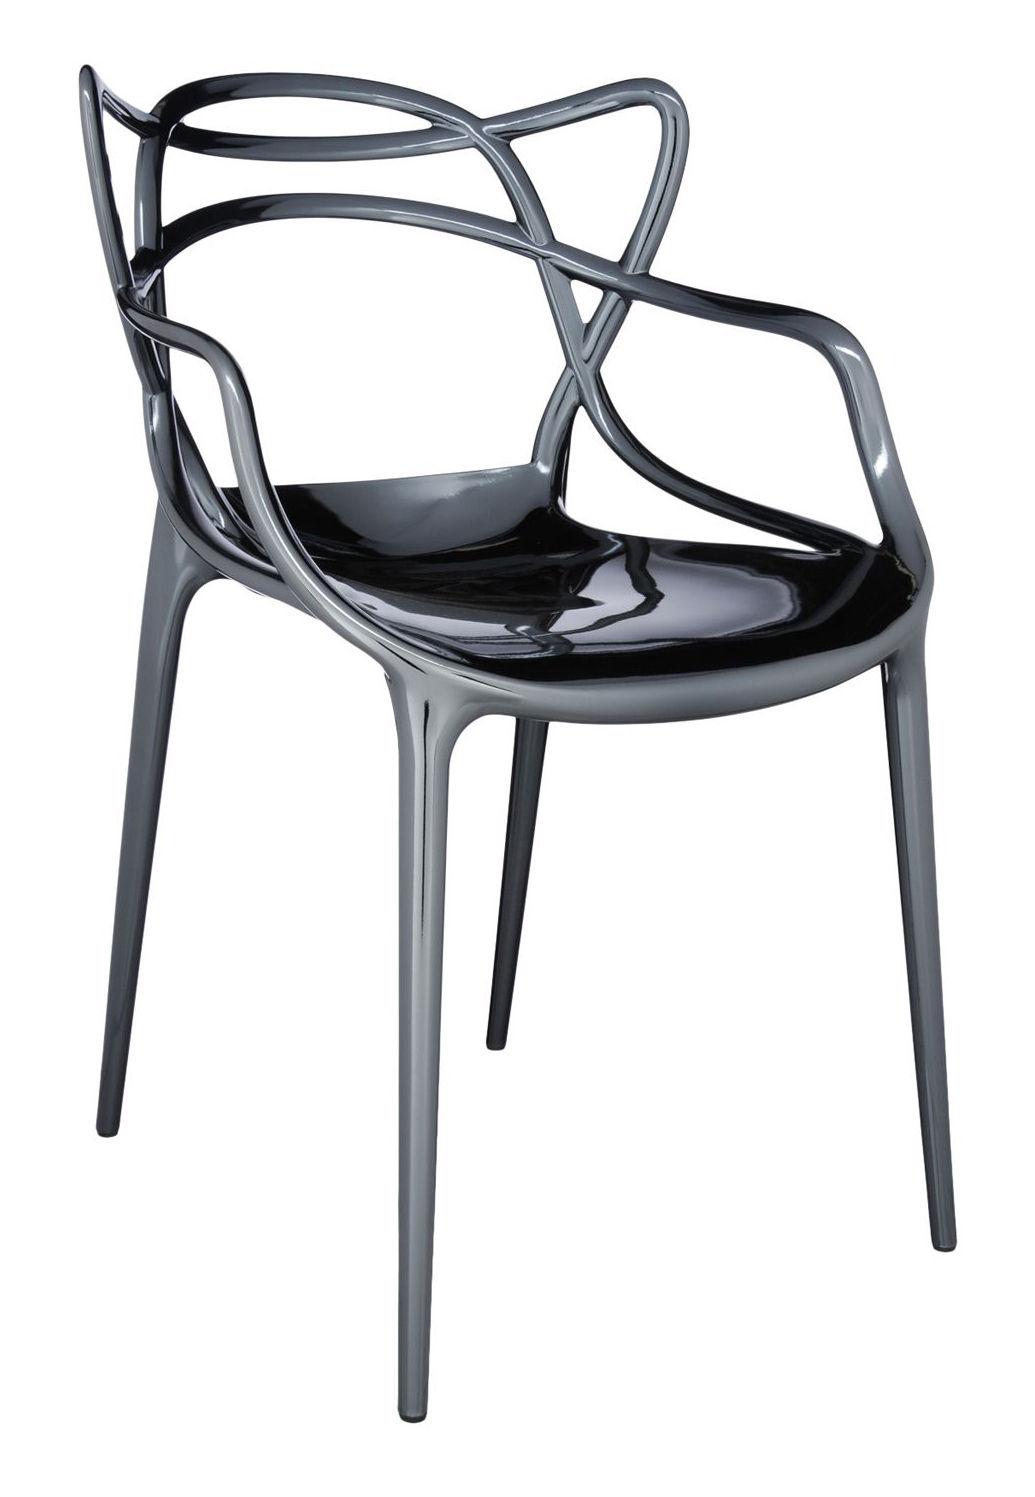 Arredamento - Sedie  - Poltrona impilabile Masters / Metallizzato - Kartell - Titanio - Polypropylène métallisé